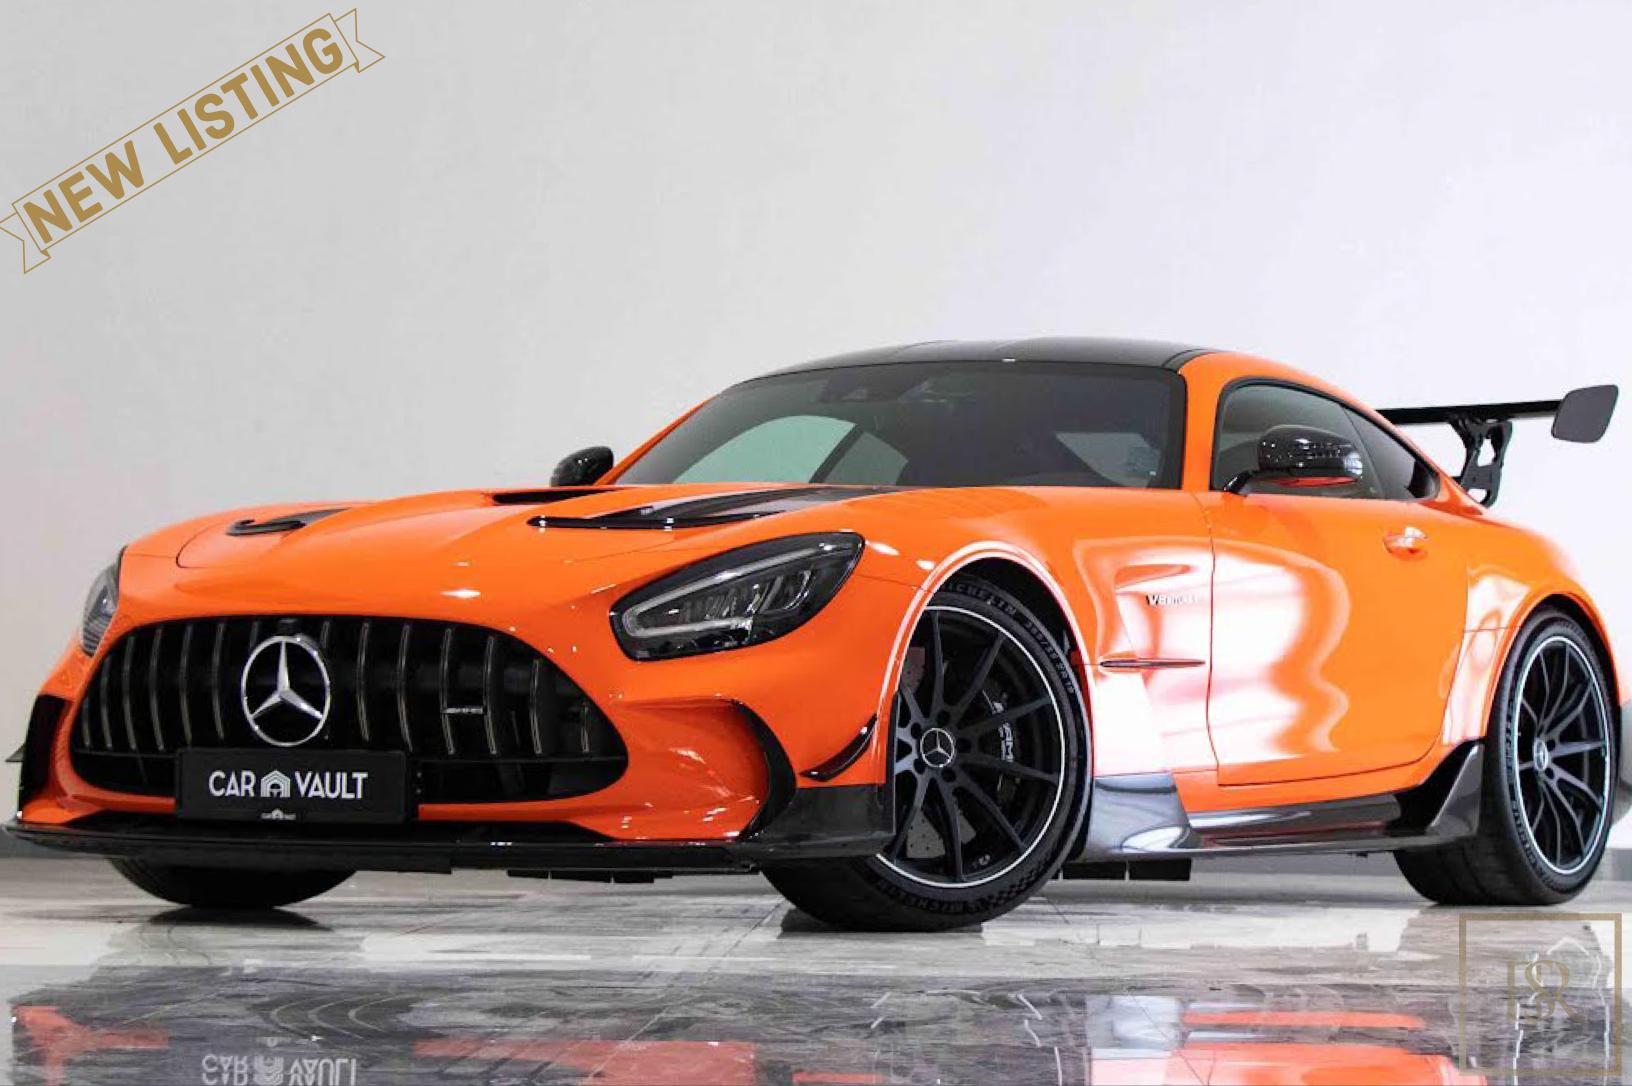 2021 Mercedes AMG for sale For Super Rich